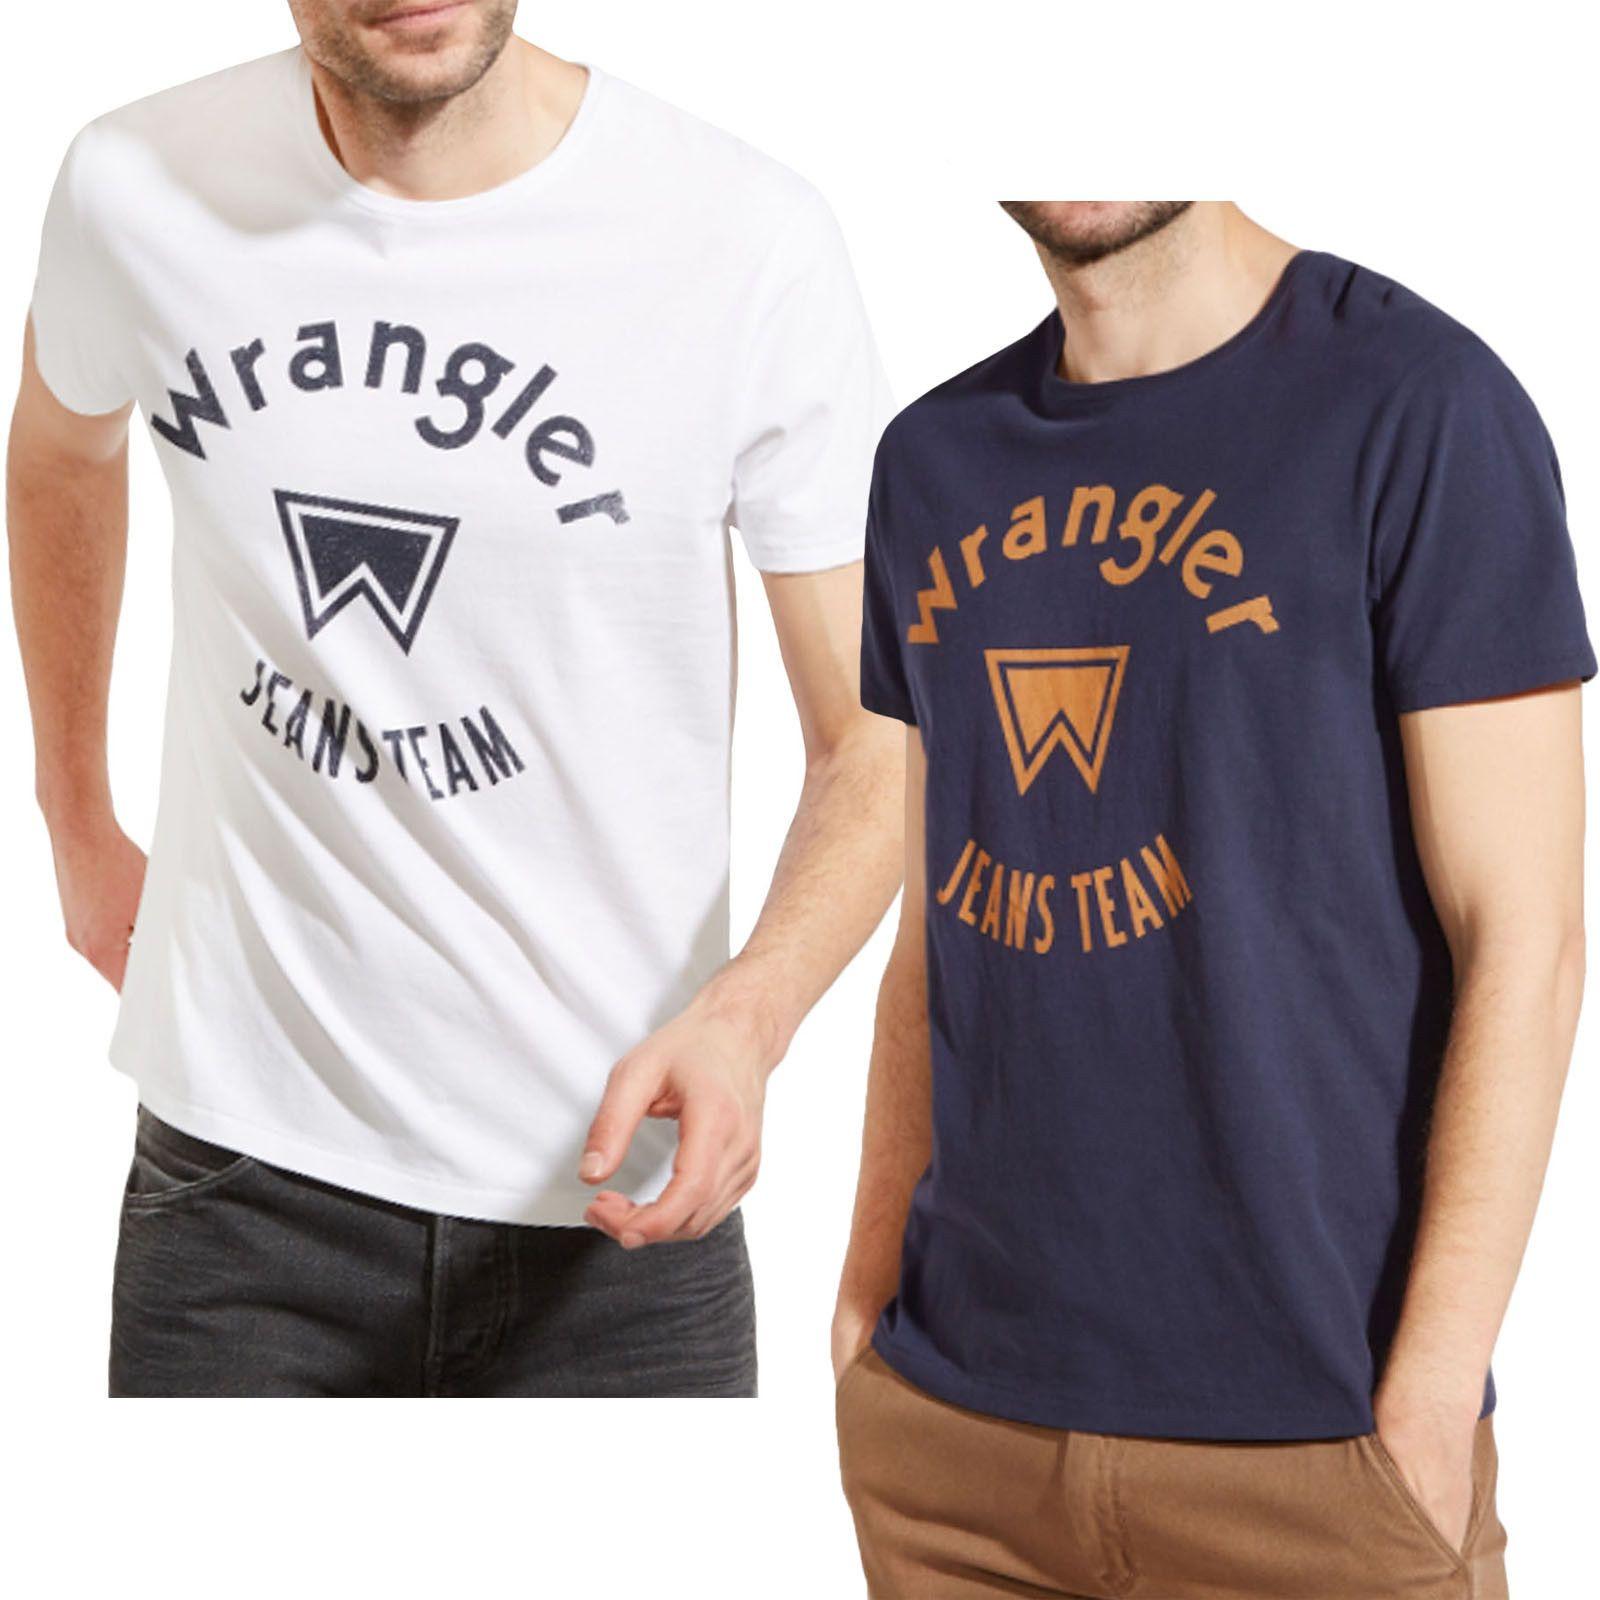 c699e54c Wrangler Jeans Team Mens Short Sleeve Crew Neck Cotton T Shirt Tee Top  Funny Unisex Casual Tee Gift Design Tee Shirts T Shirt Funny From  Tshirtsinc, ...